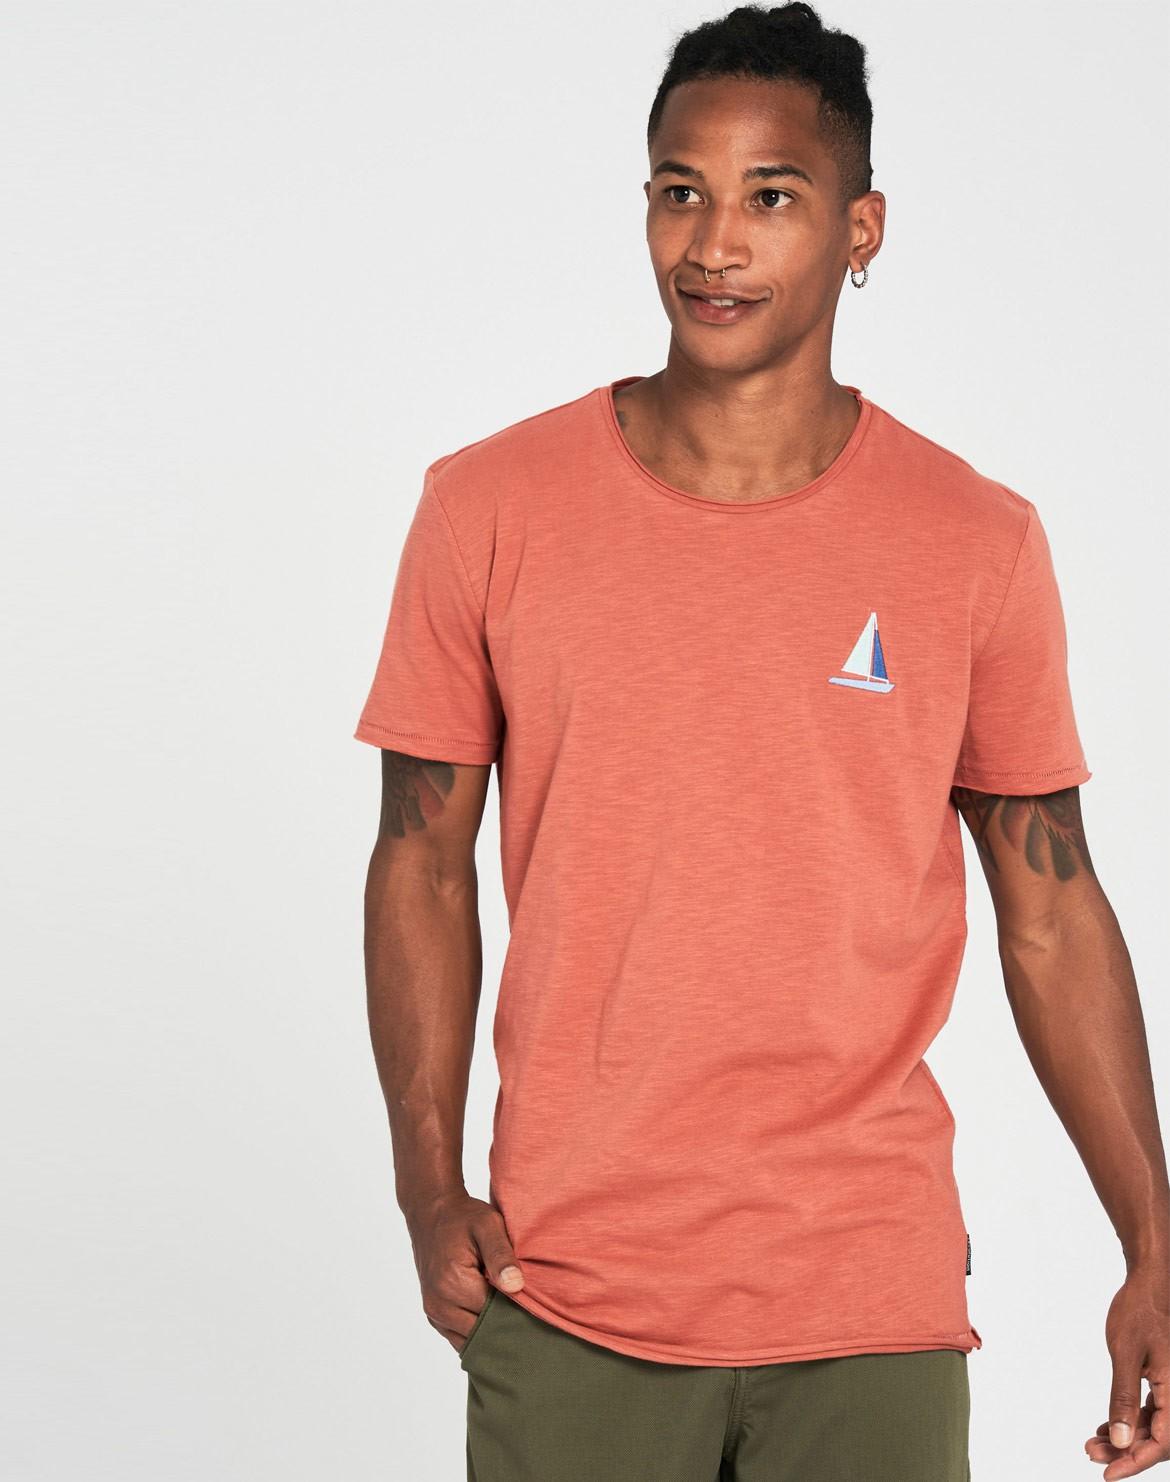 Sailingboat Casual T-Shirt